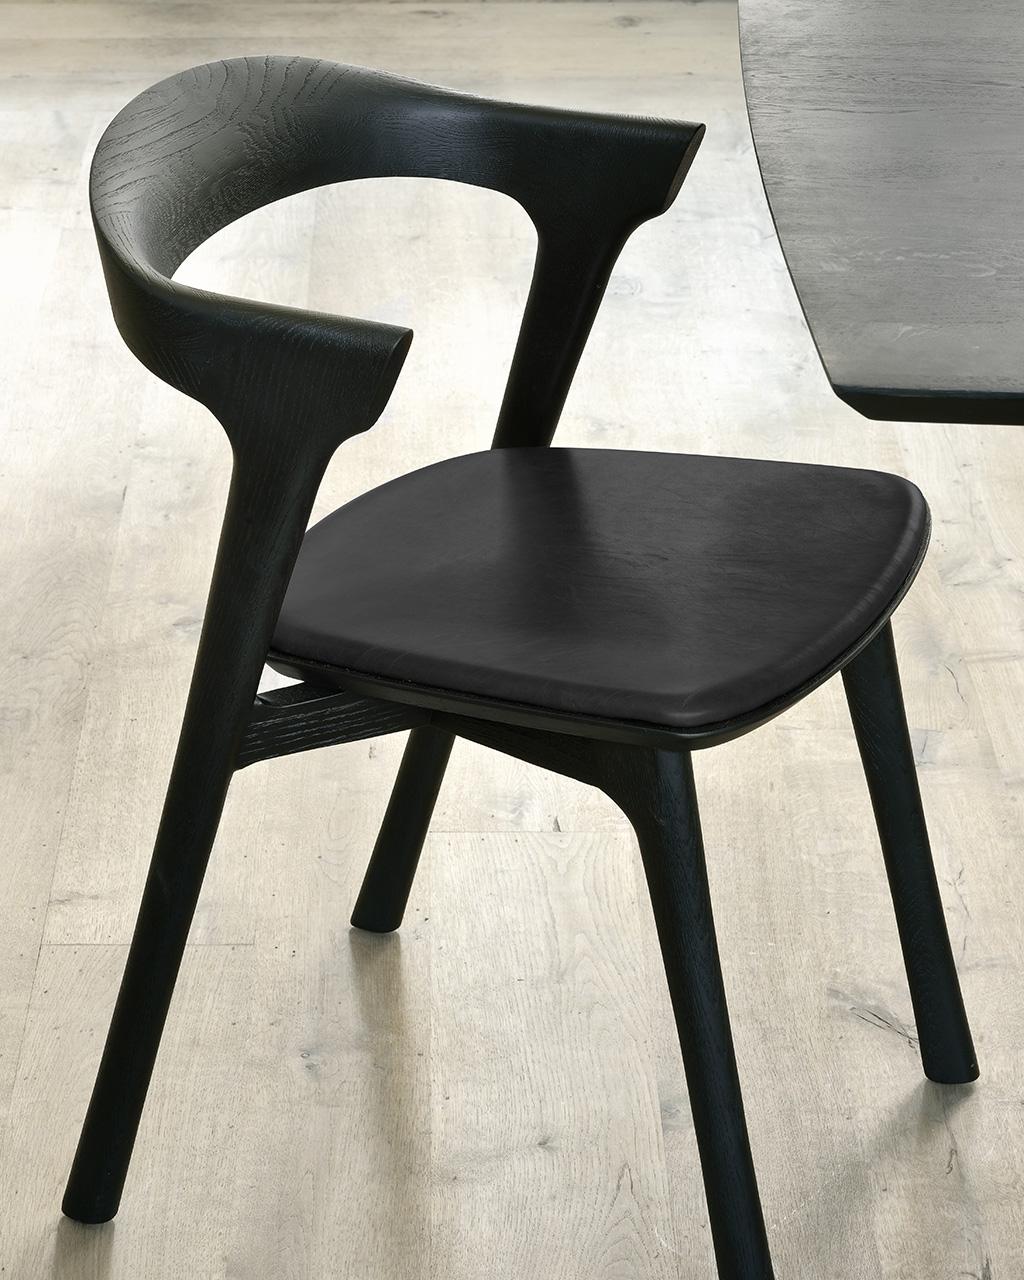 Biennale Interieur - Belgium's leading design and interior event - 51492_oak_bok_black_dining_chair_black_leather.jpg